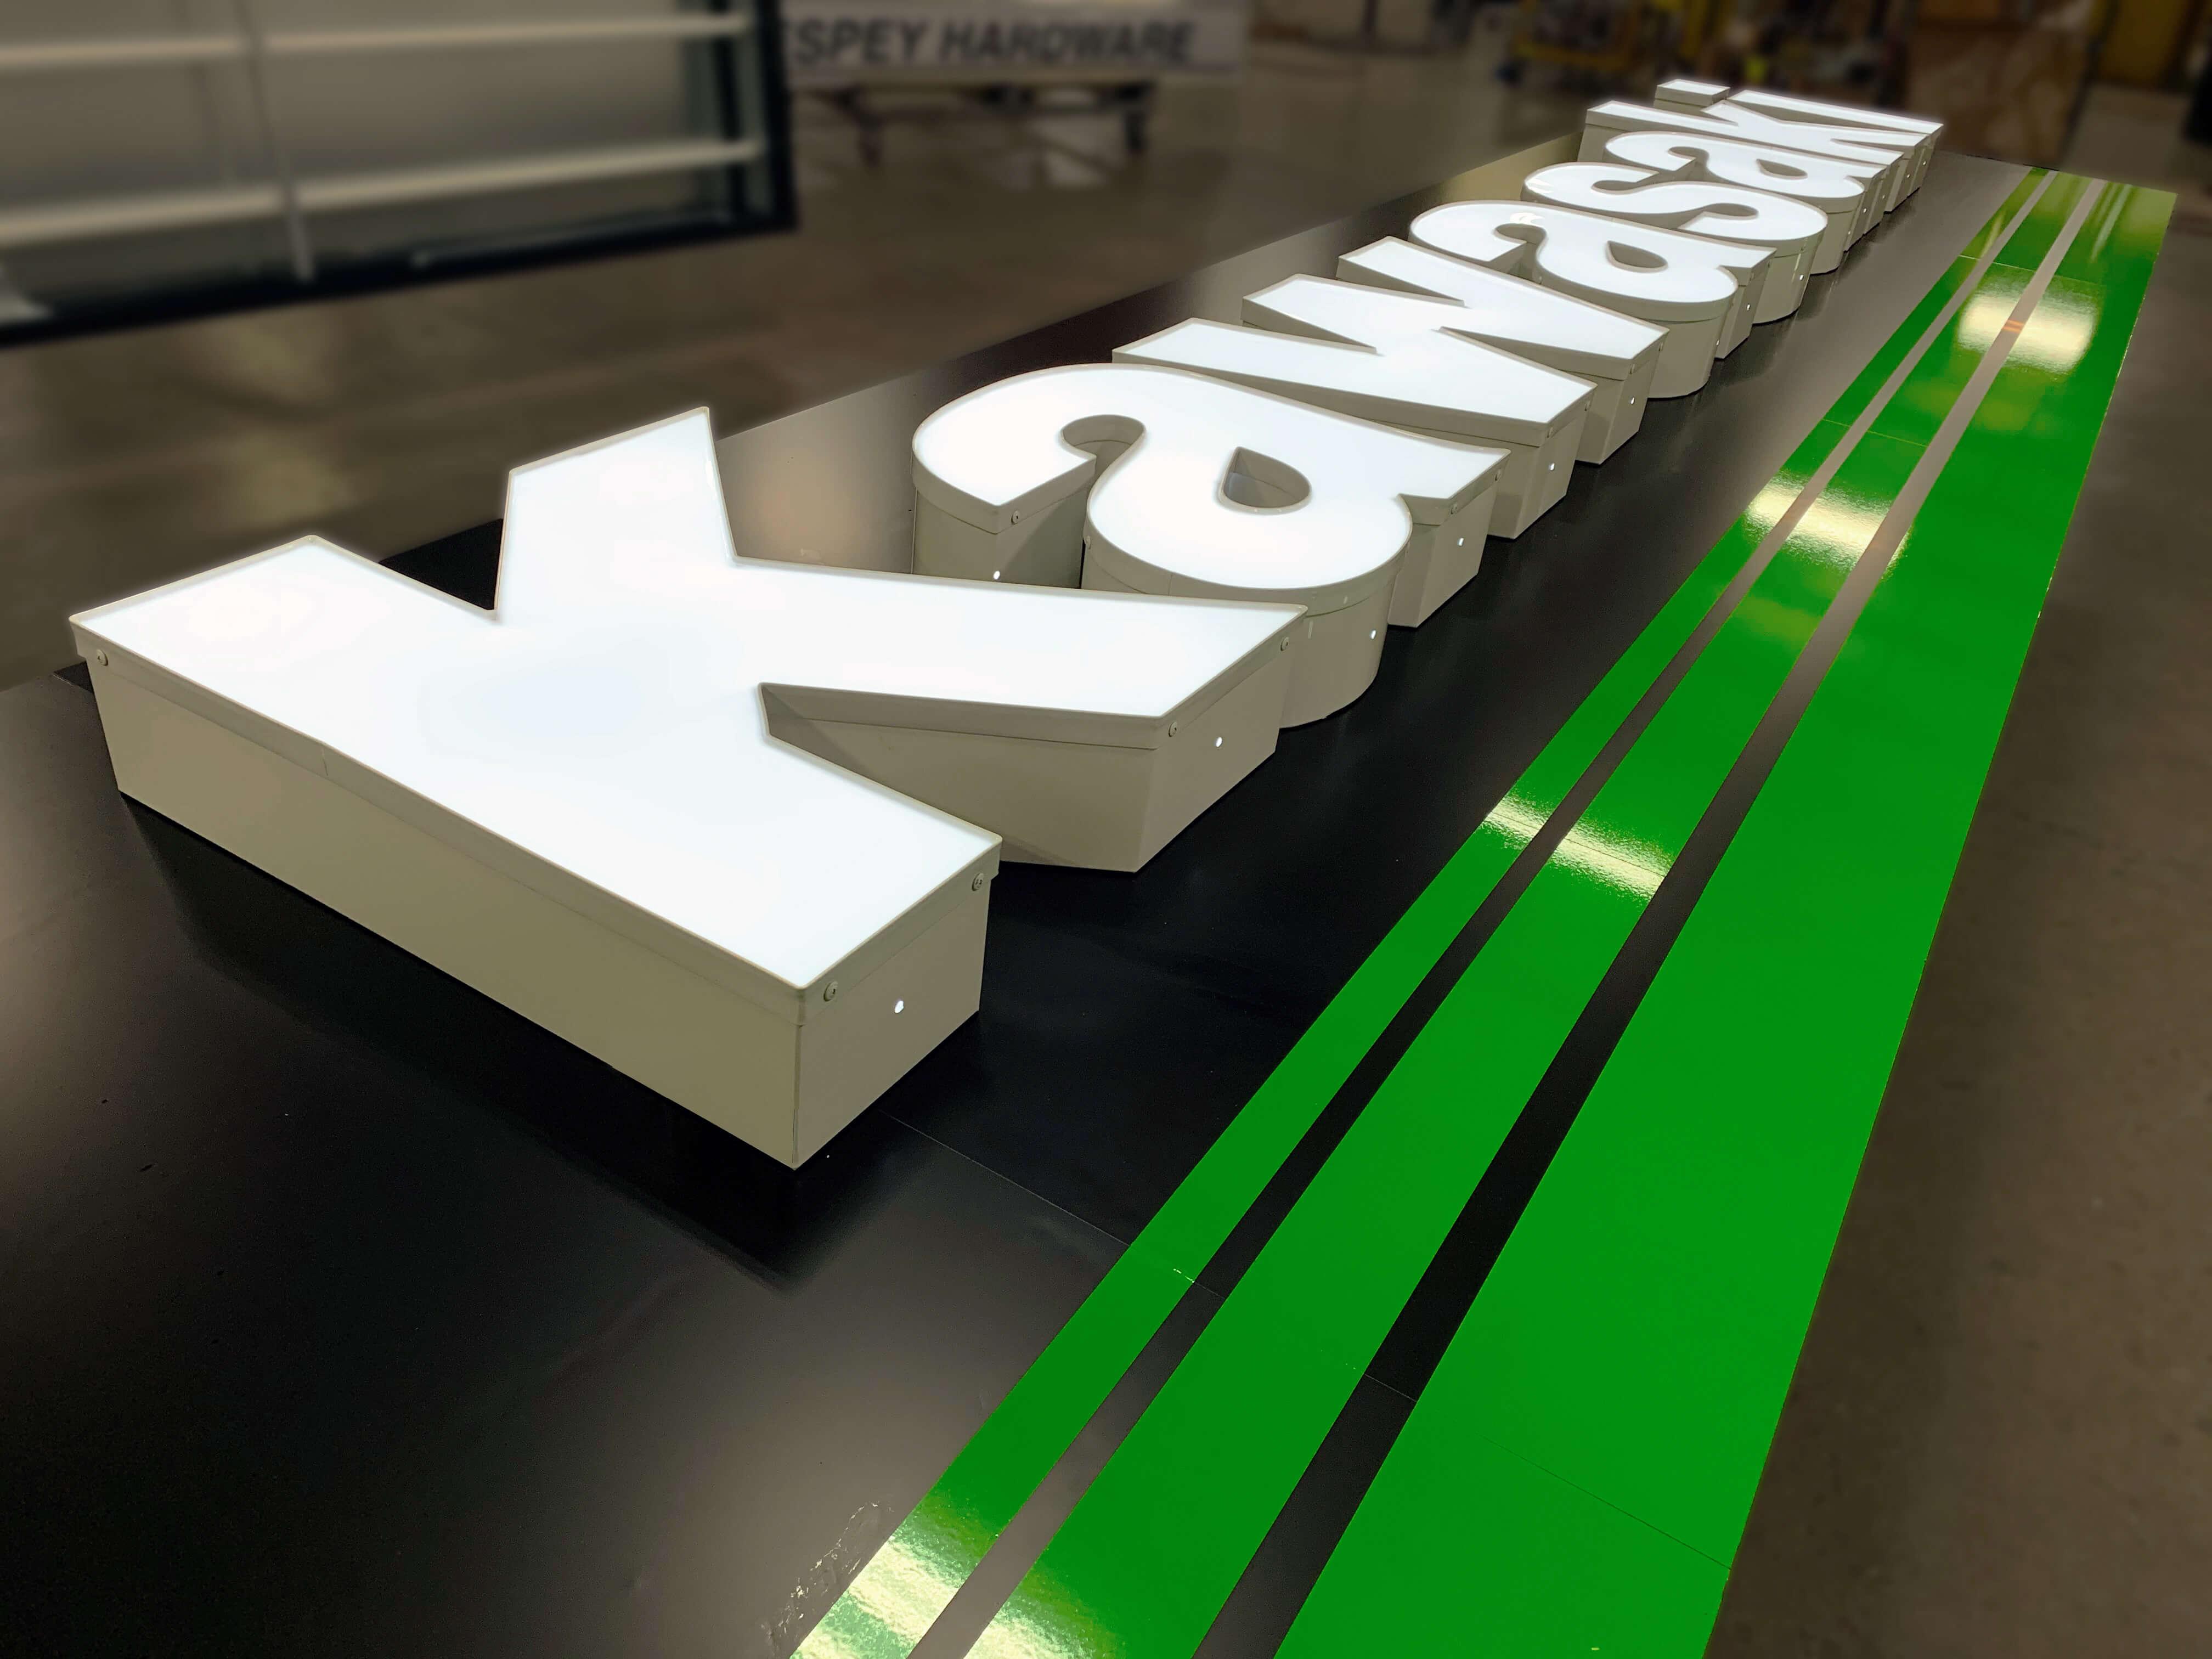 A large custom fabricated Kawasaki channel letter set.